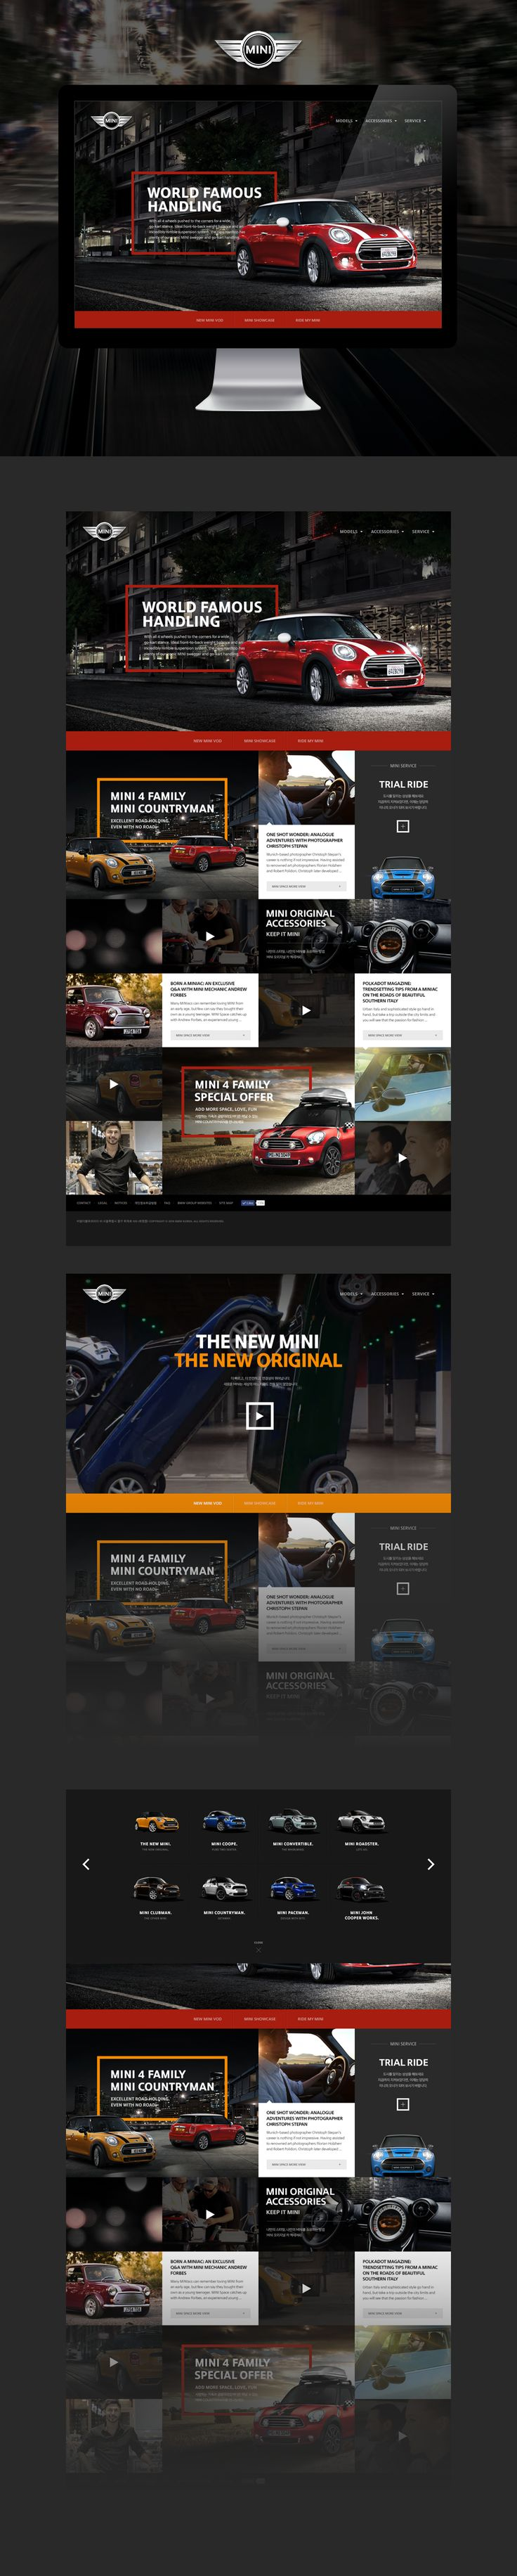 MINI Concept Design on Behance